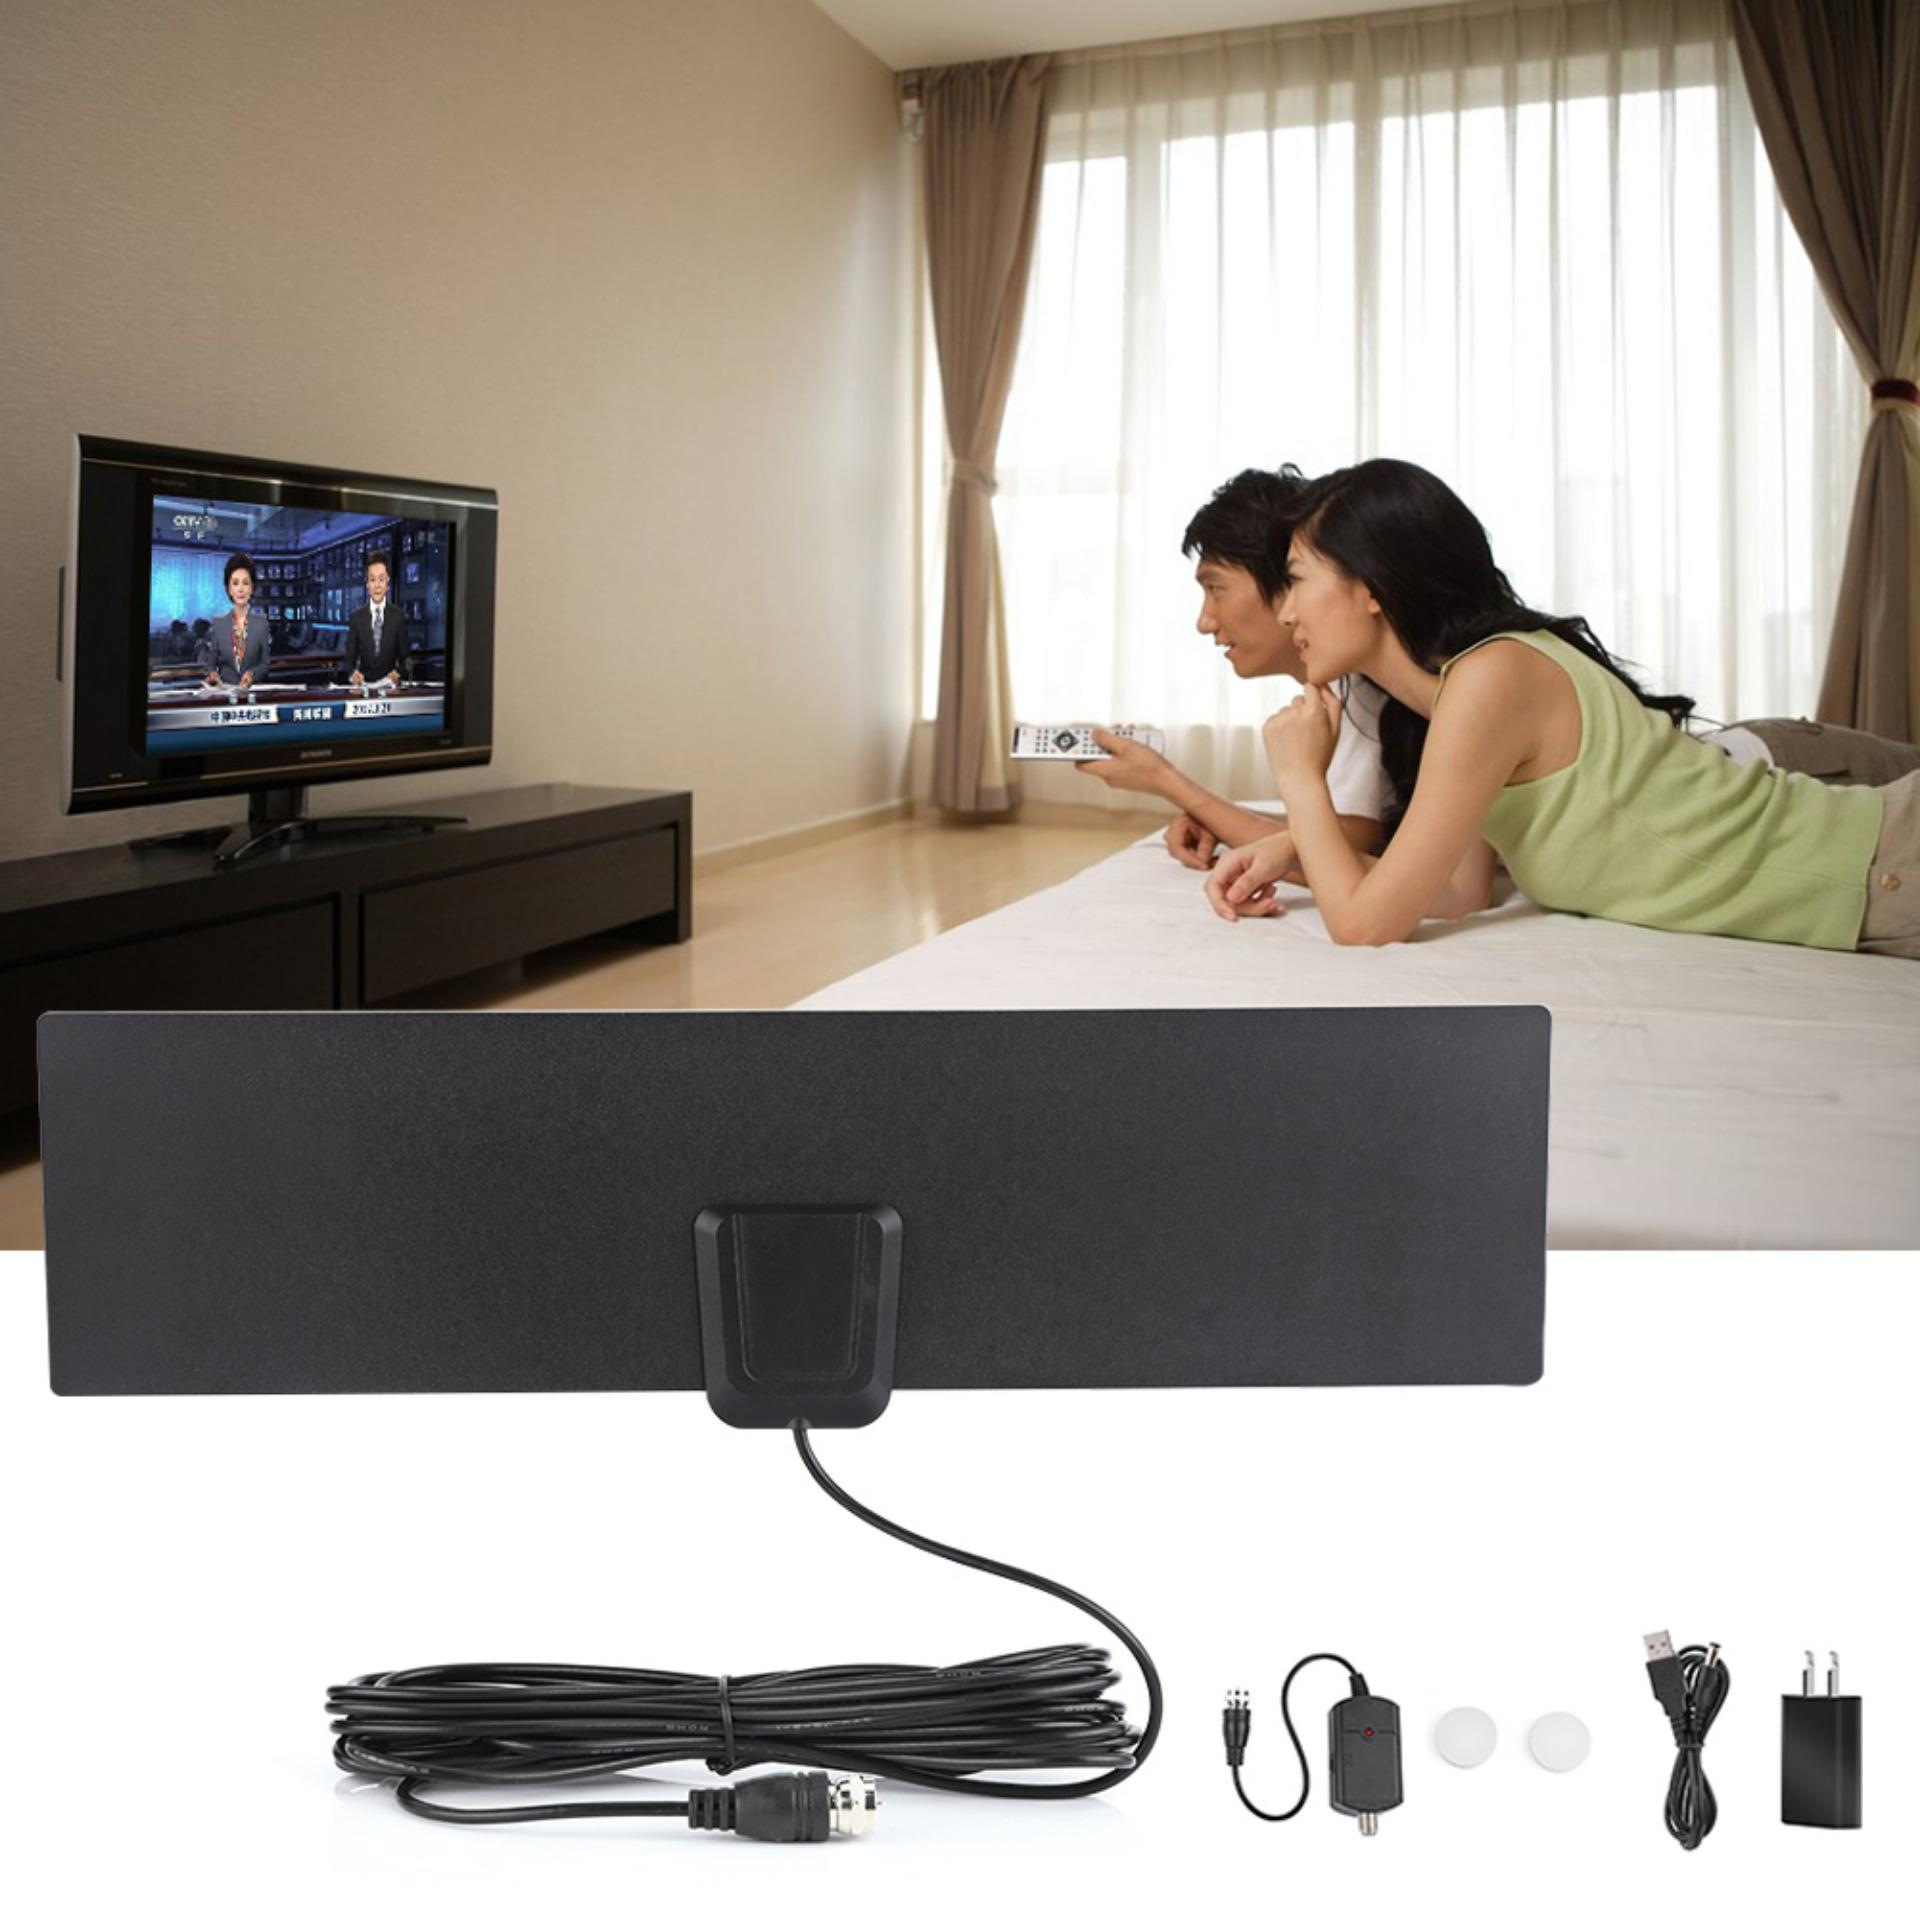 Review Ultra Thin 50 Miles High Gain Indoor Amplifier Digital Flat Tv Hdtv Antenna Eu Plug Intl On China